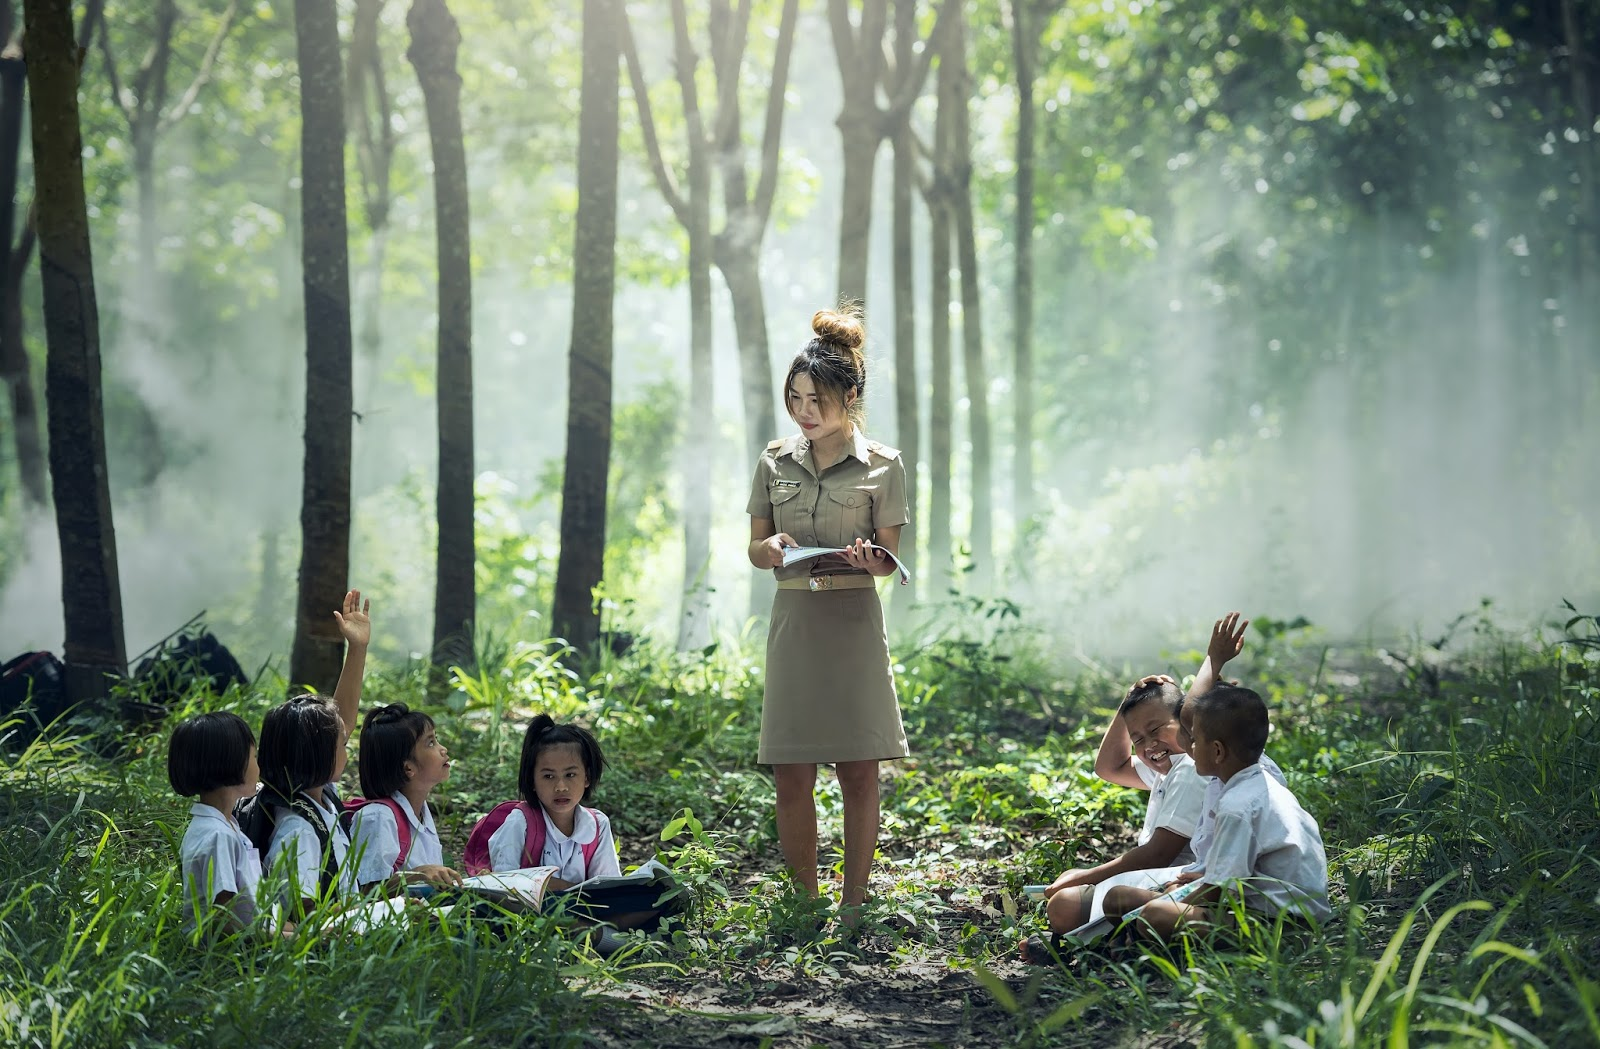 Model-model Pembelajaran Yang Dianjurkan Pada Kurikulum 2013